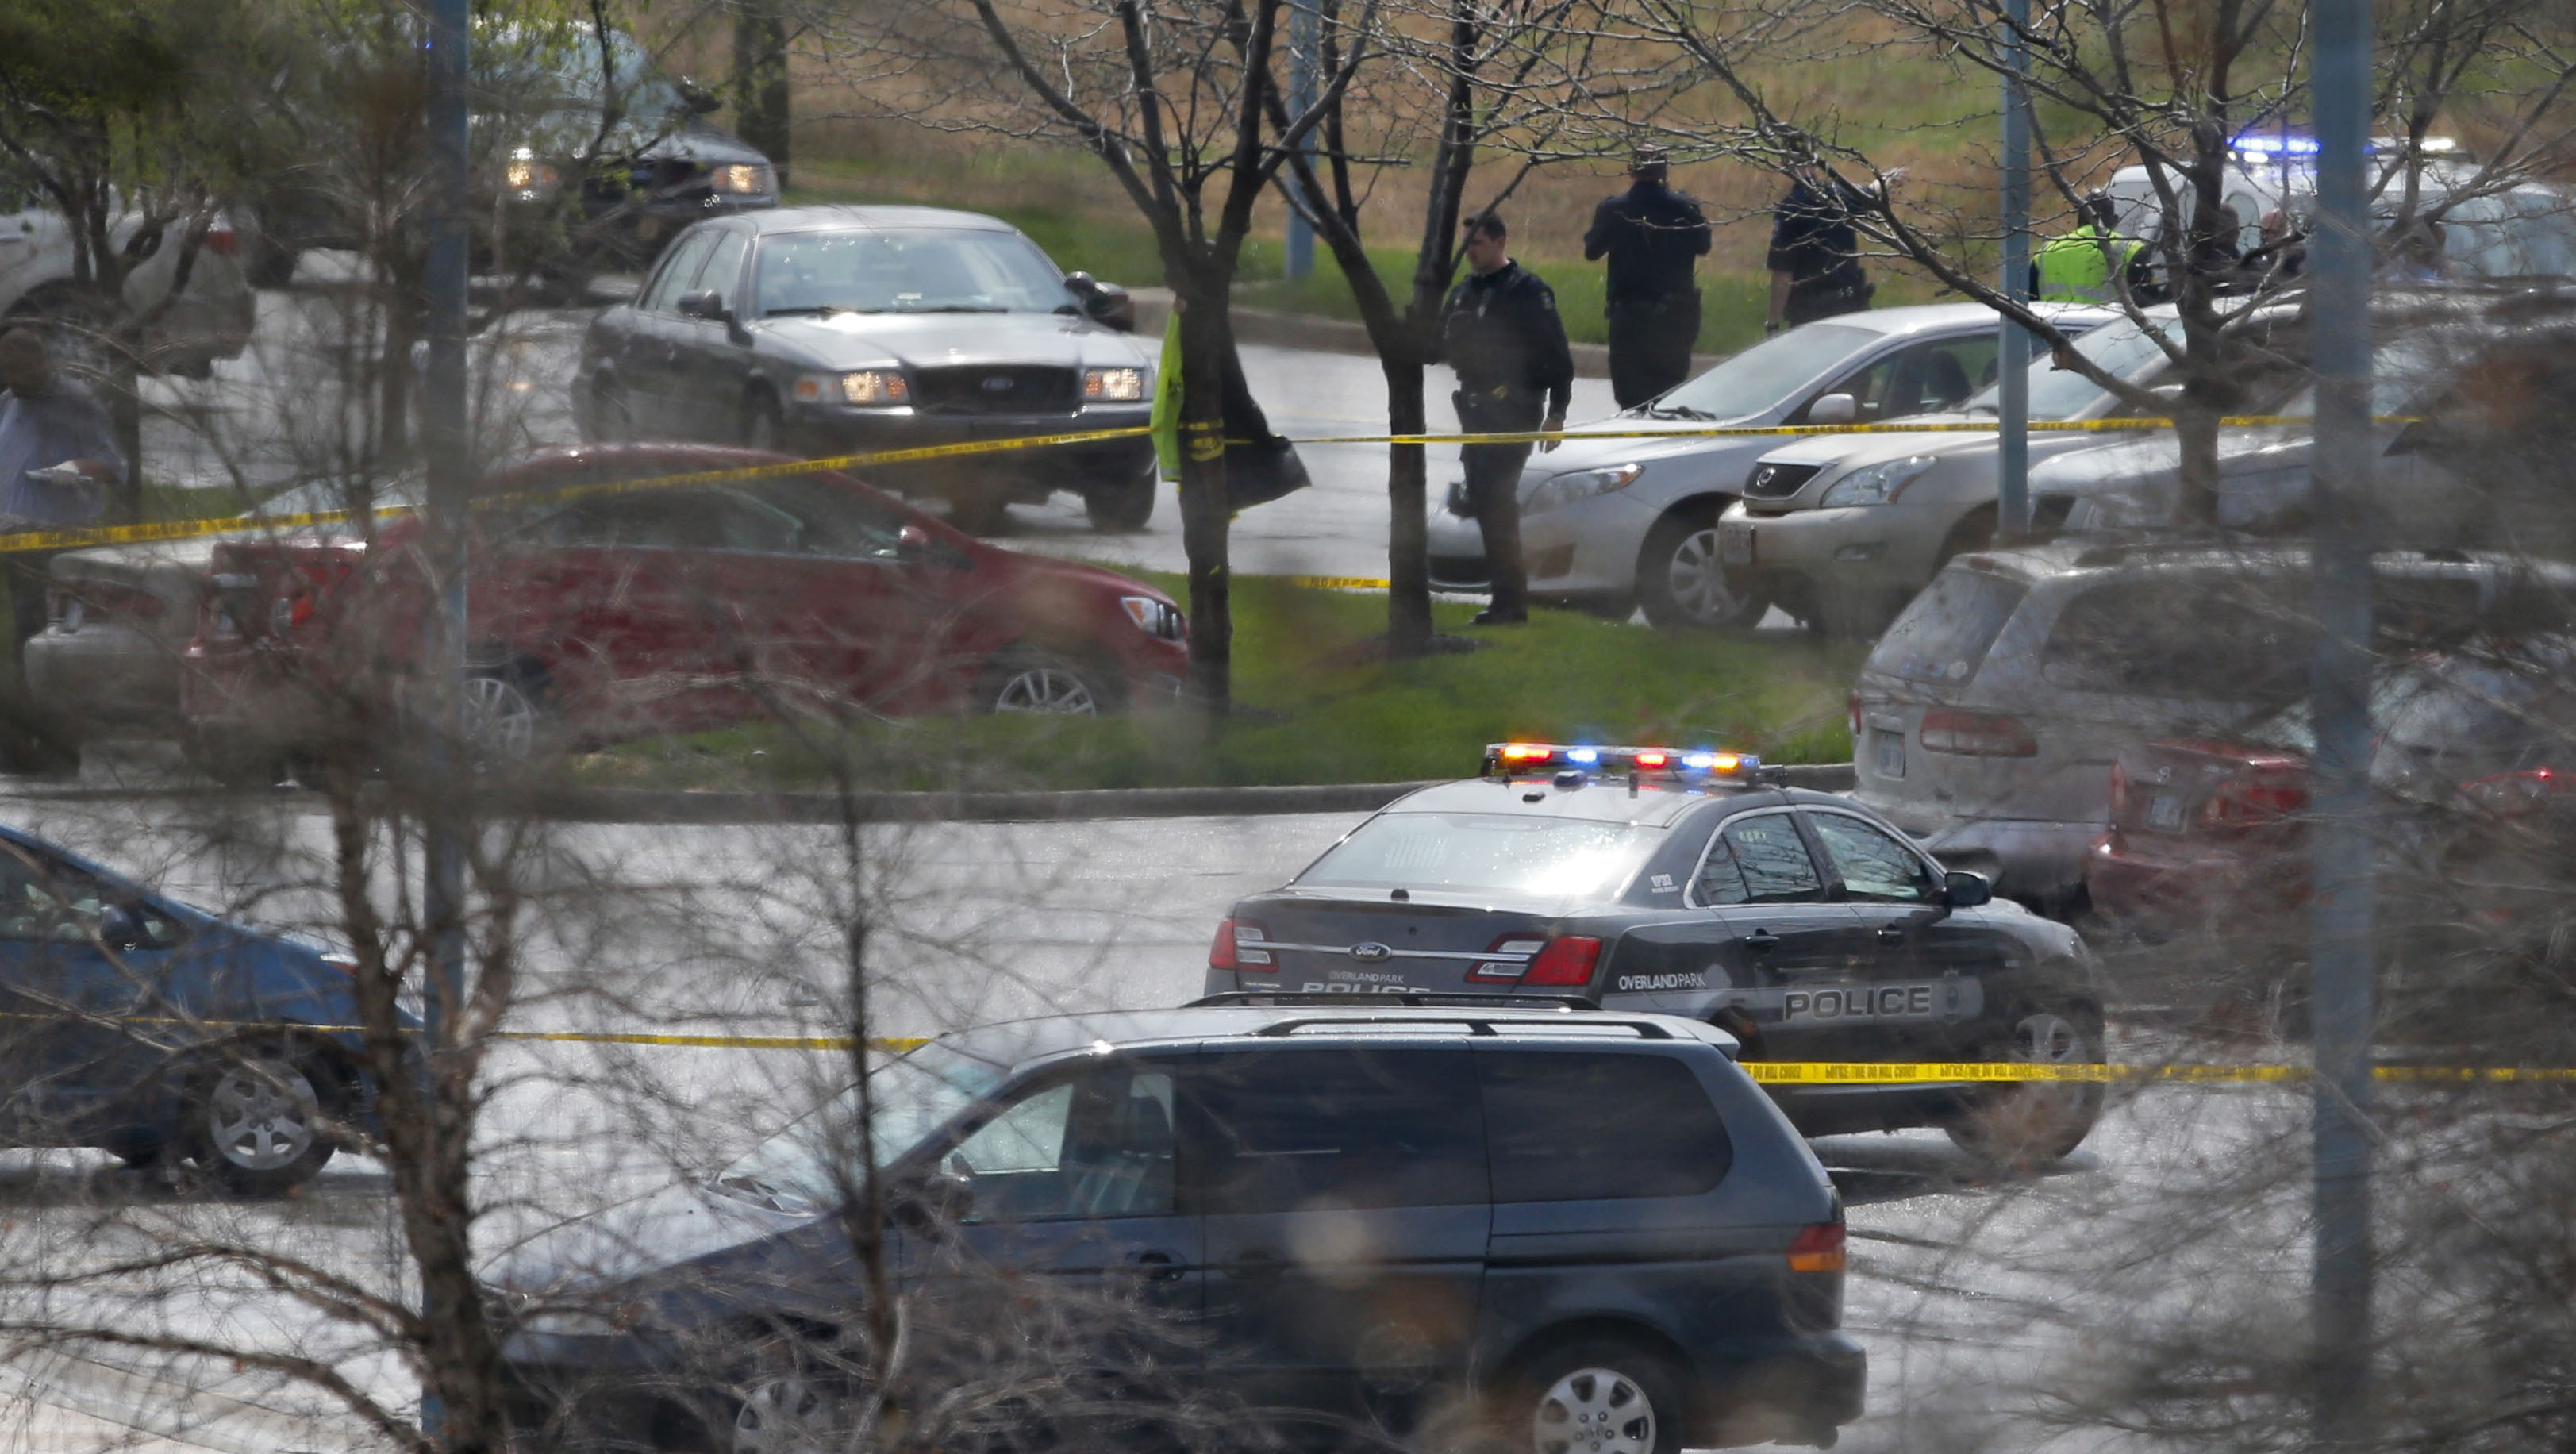 Three dead in shootings at Jewish facilities in Kansas City suburb